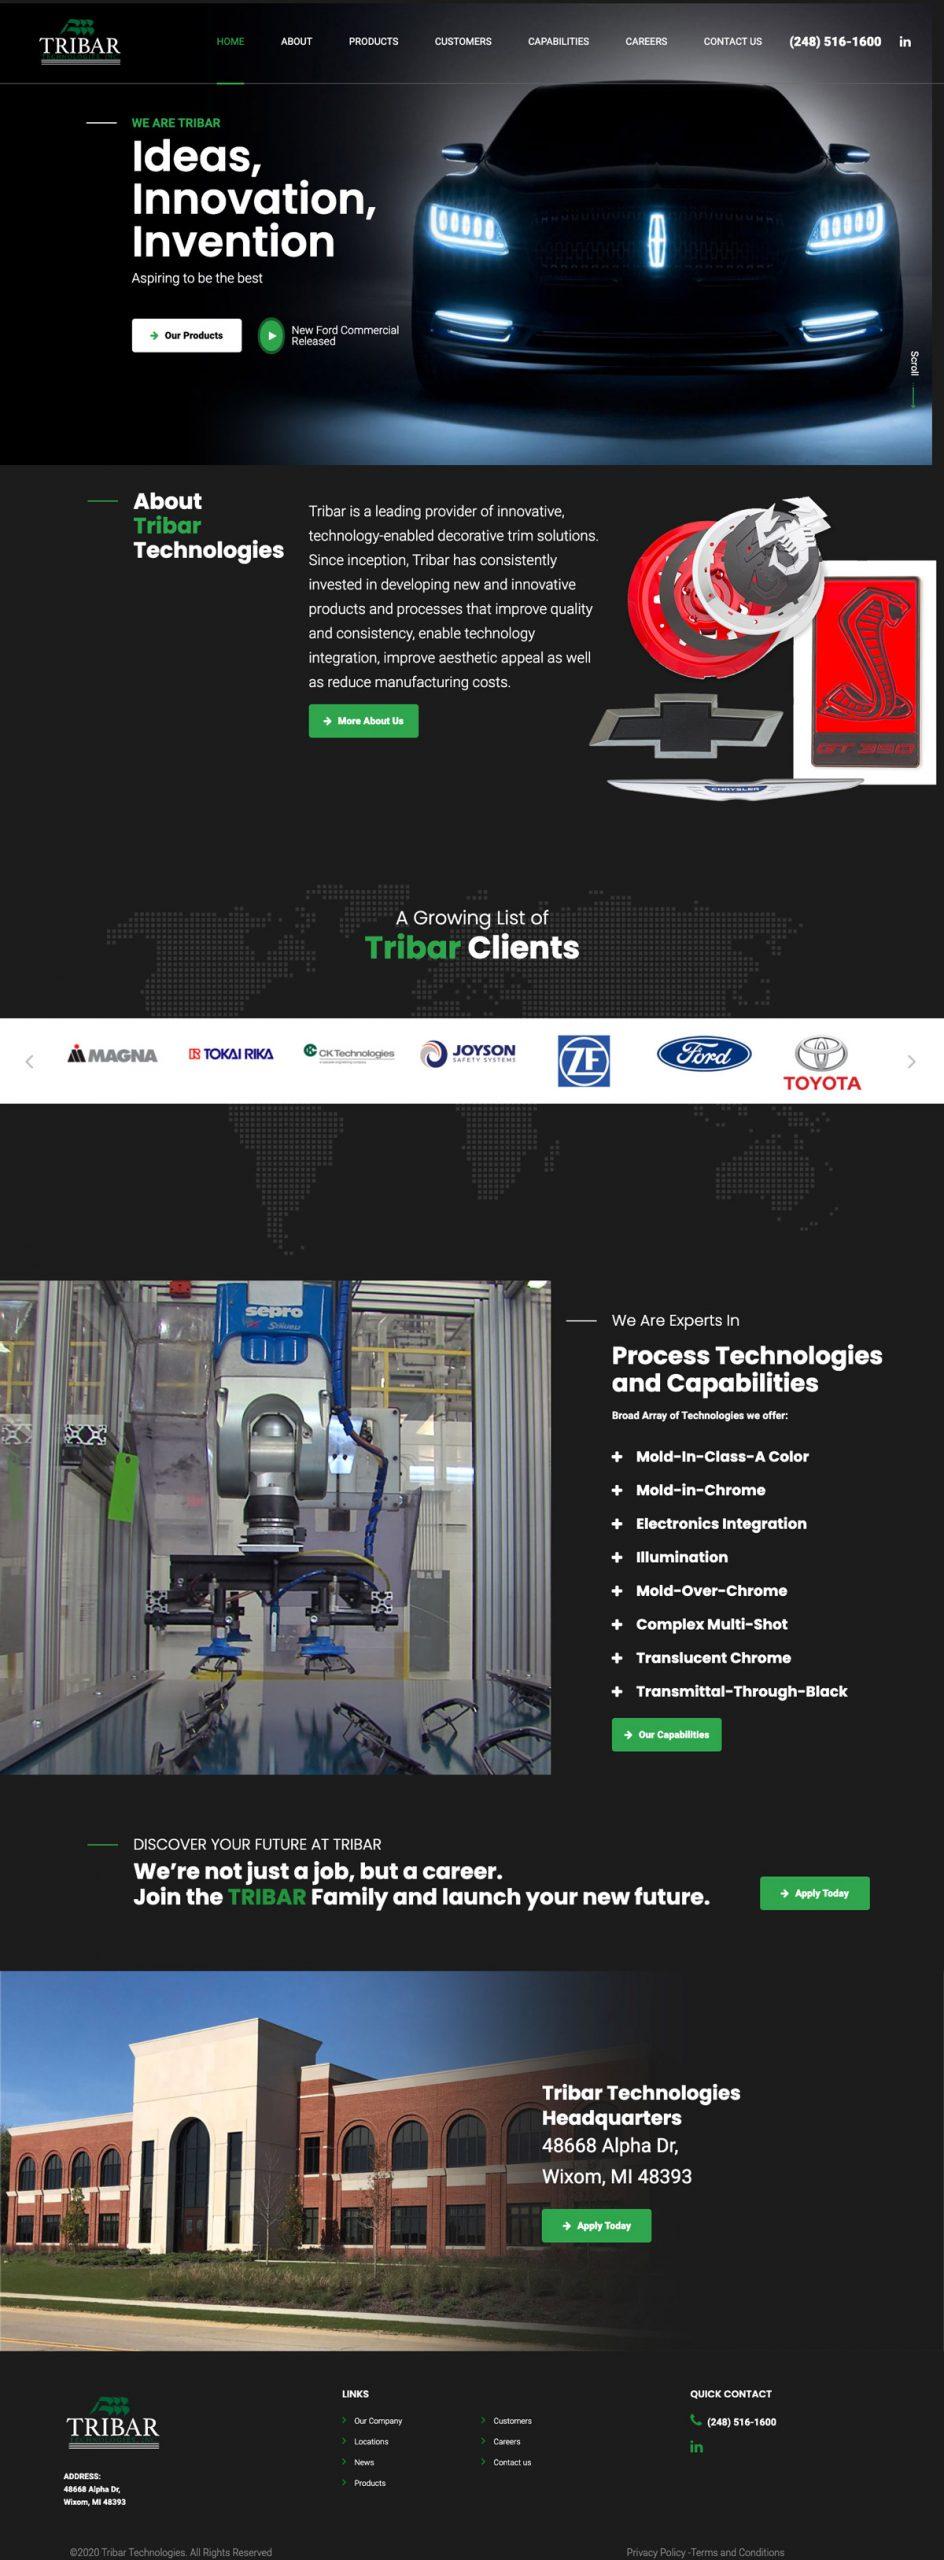 Tribar Technologies Inc